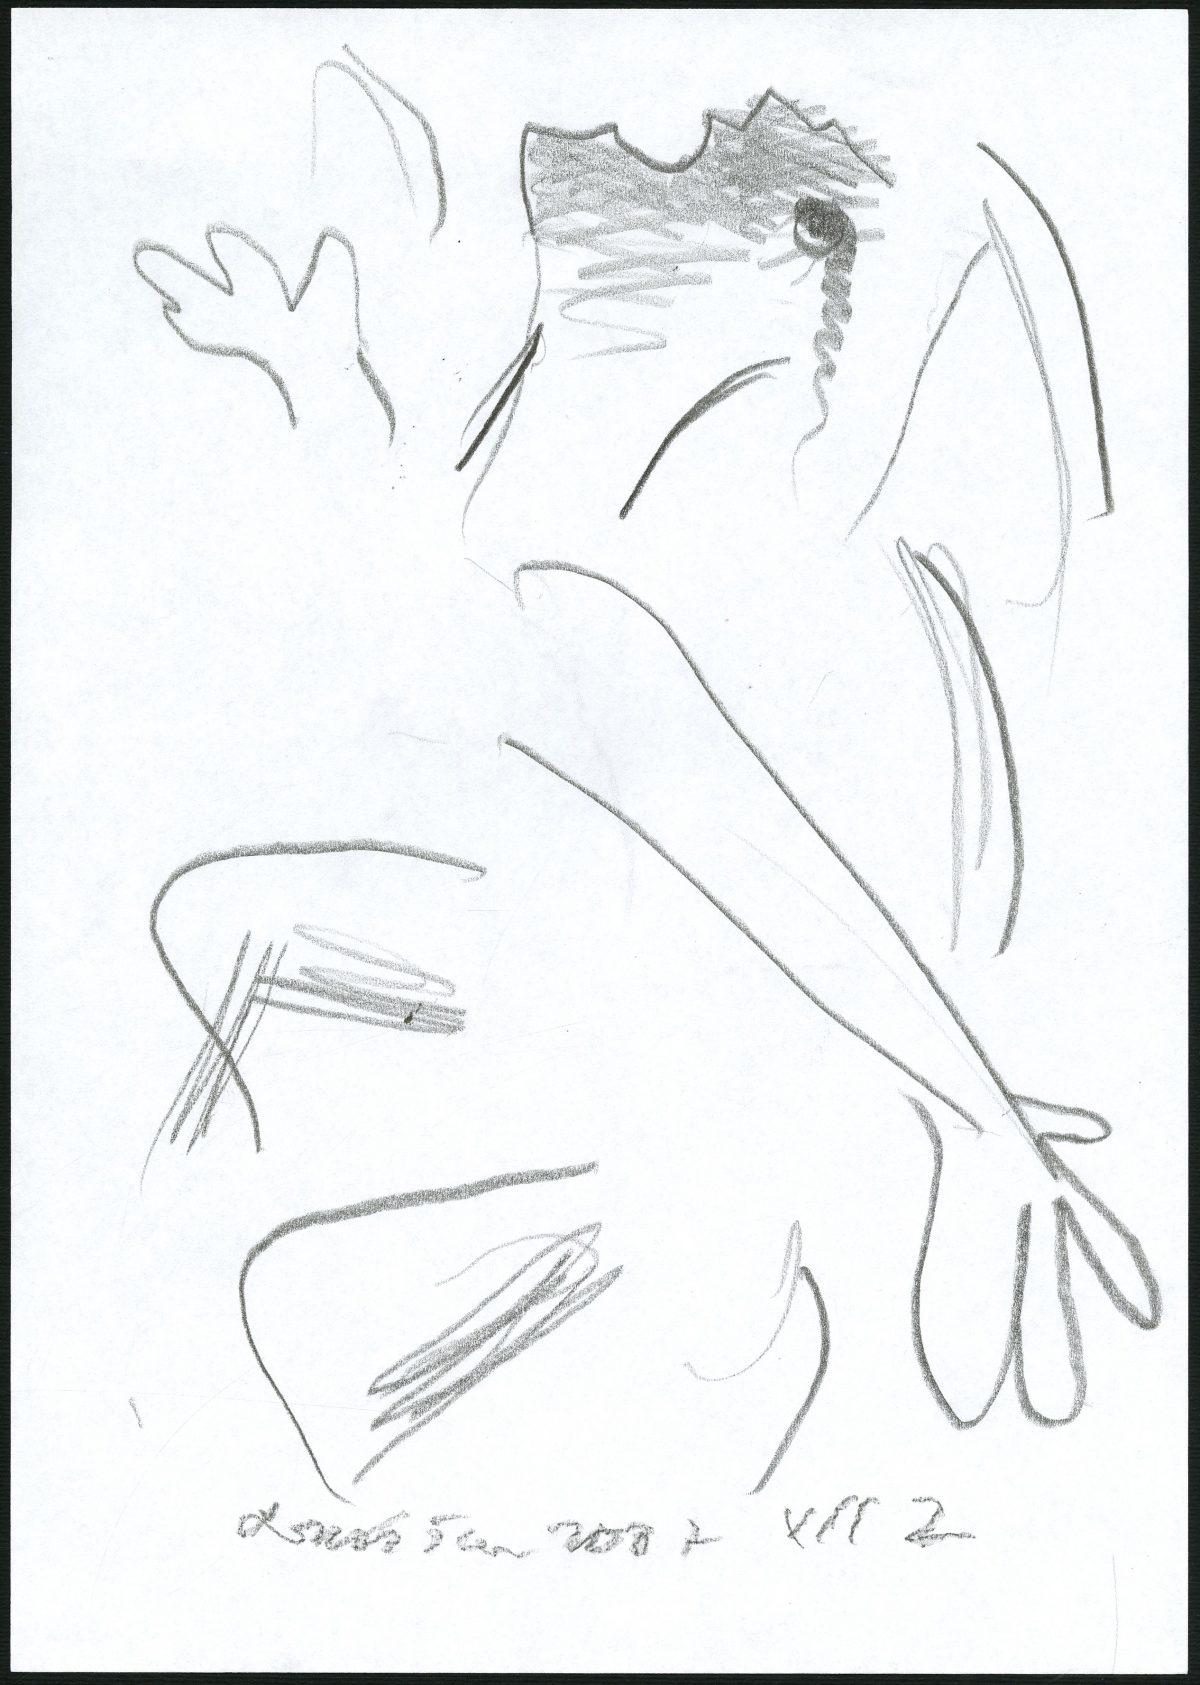 G27317(103)<br/> <b>Cím:</b> Dal az emberről <br/> <b>Méret cm:</b> 29,8x21 <br/> <b>Készült:</b> 2007. <br/> <b>Technika:</b> ceruza<br/>